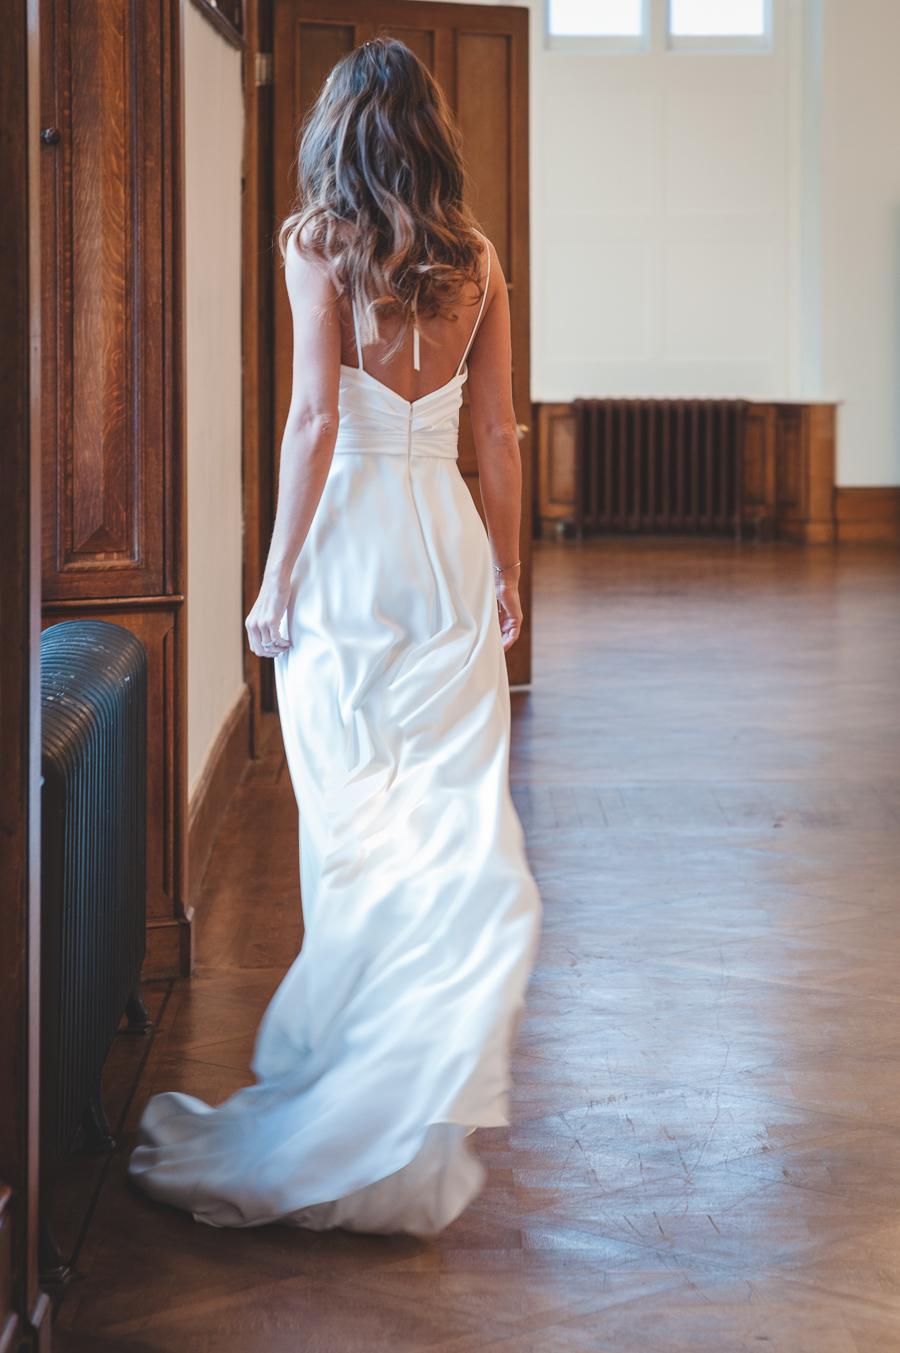 Yorkshire wedding venue styling ideas, photo credit Boho Chic Weddings (10)